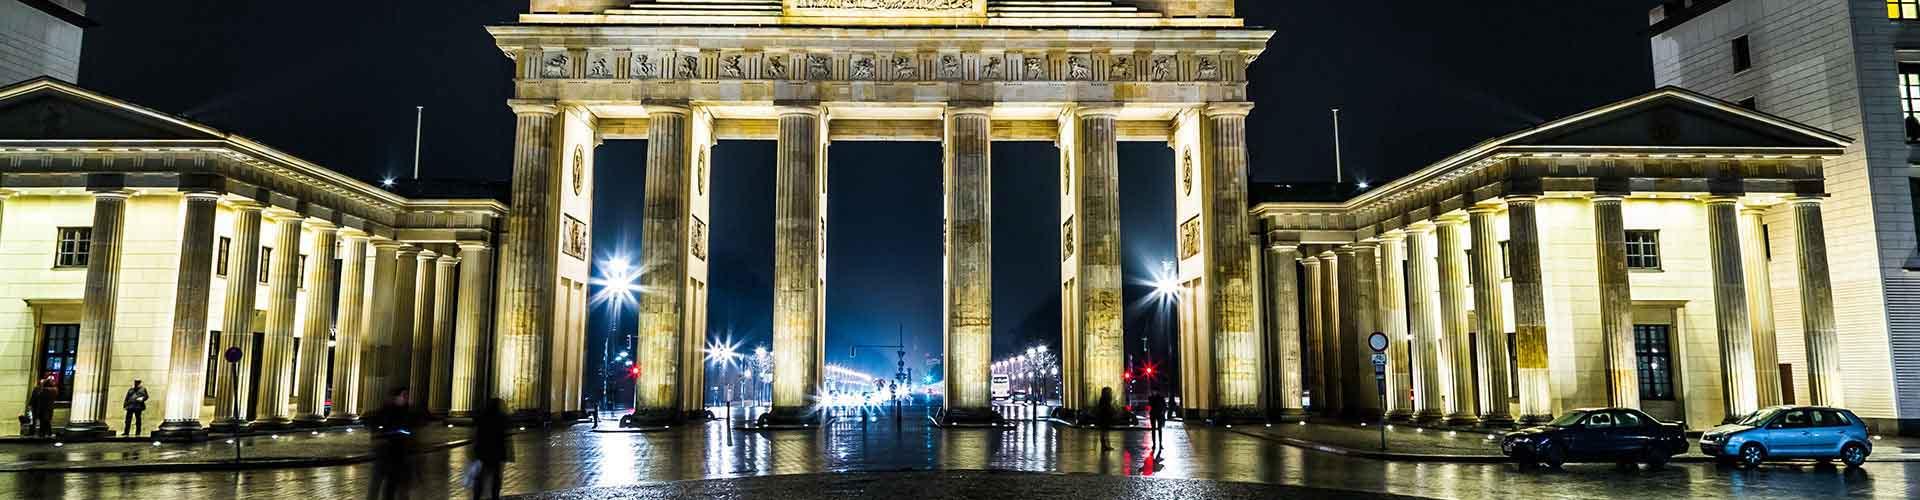 Berlín - Albergues cerca a Puerta de Brandenburgo. Mapas de Berlín, Fotos y Comentarios para cada Albergue en Berlín.